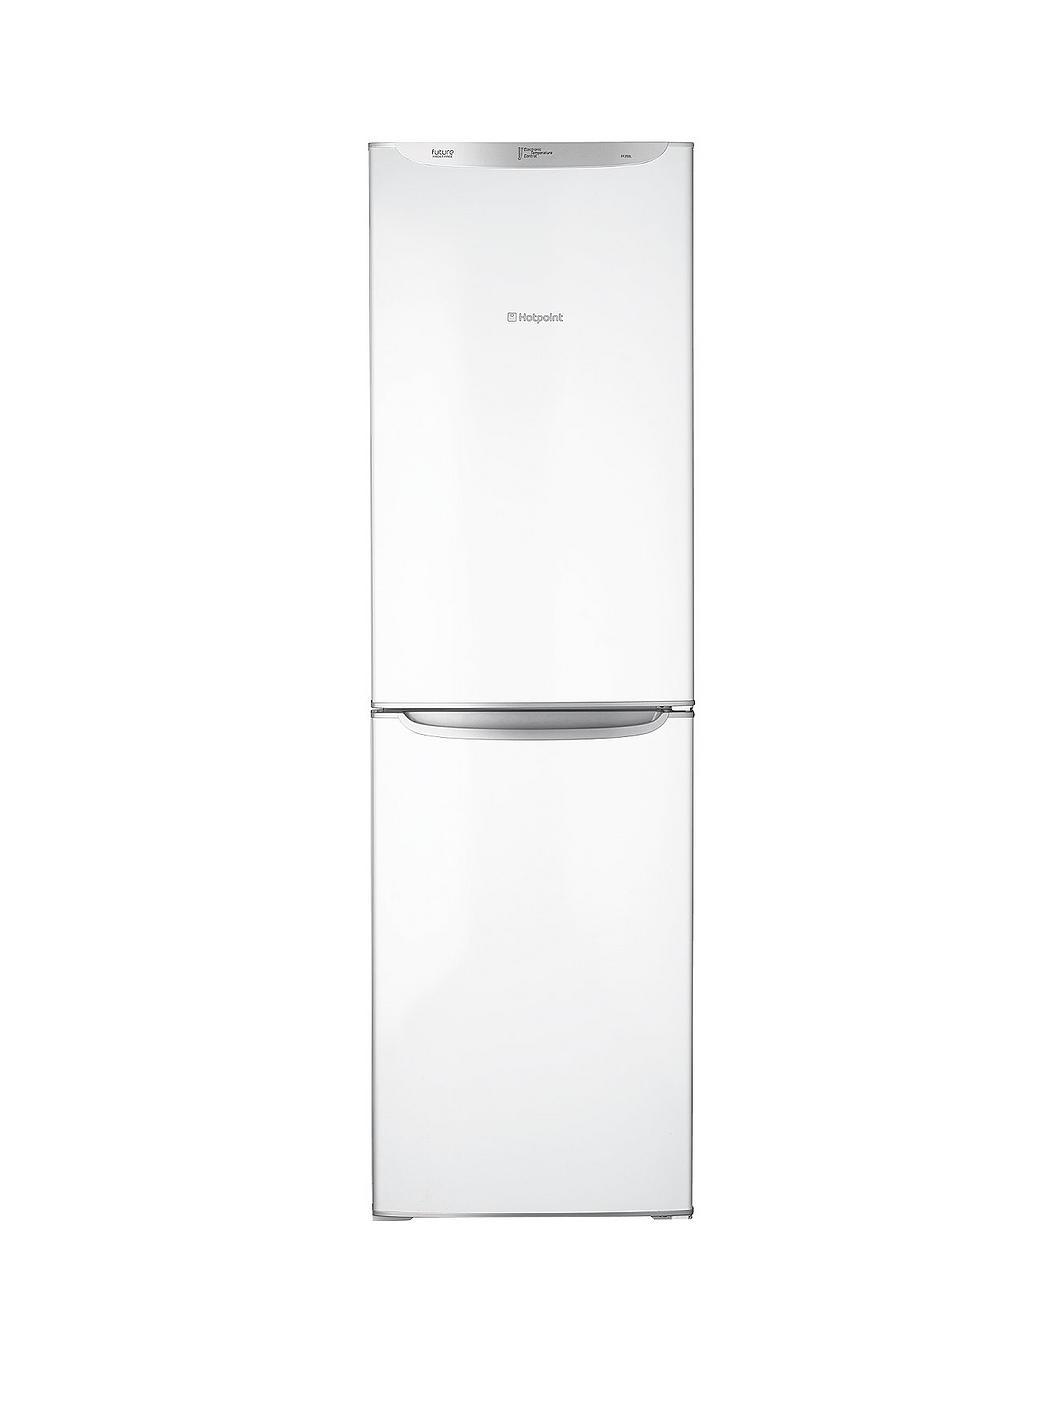 hotpoint stf200wp 60cm frost free fridge freezer white. Black Bedroom Furniture Sets. Home Design Ideas